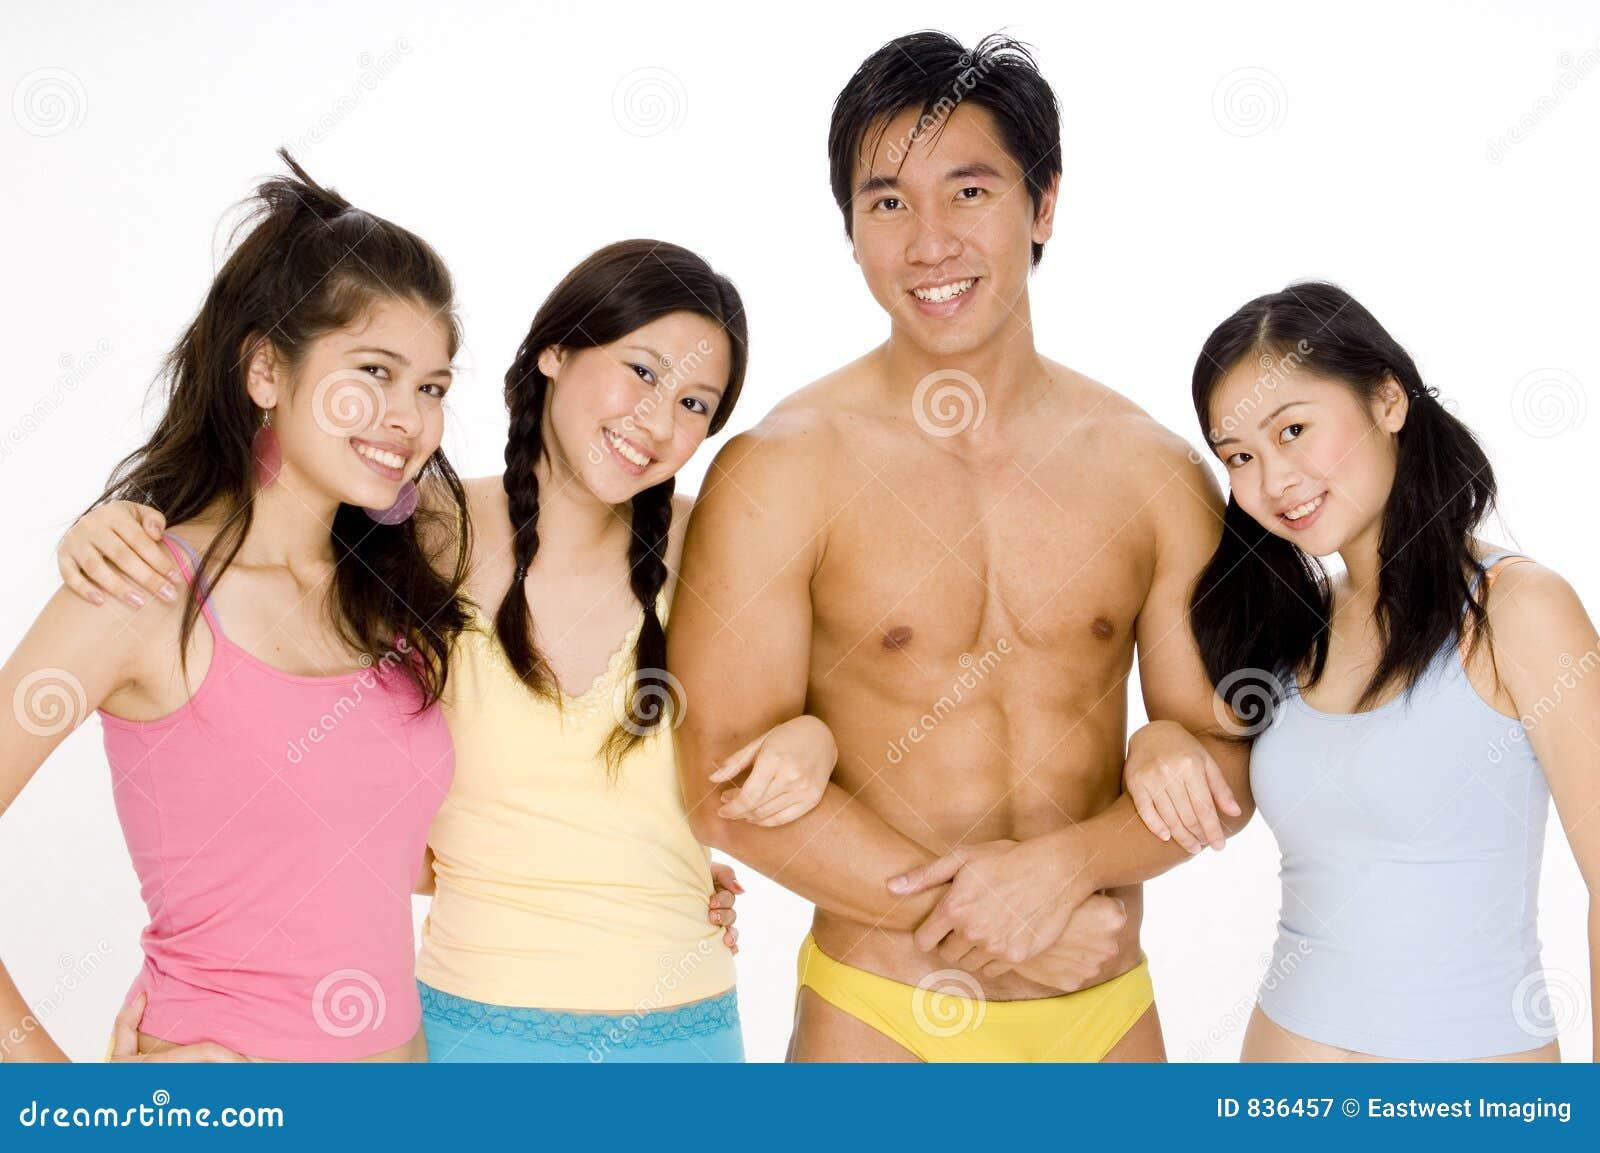 See thru thong bikini bottom